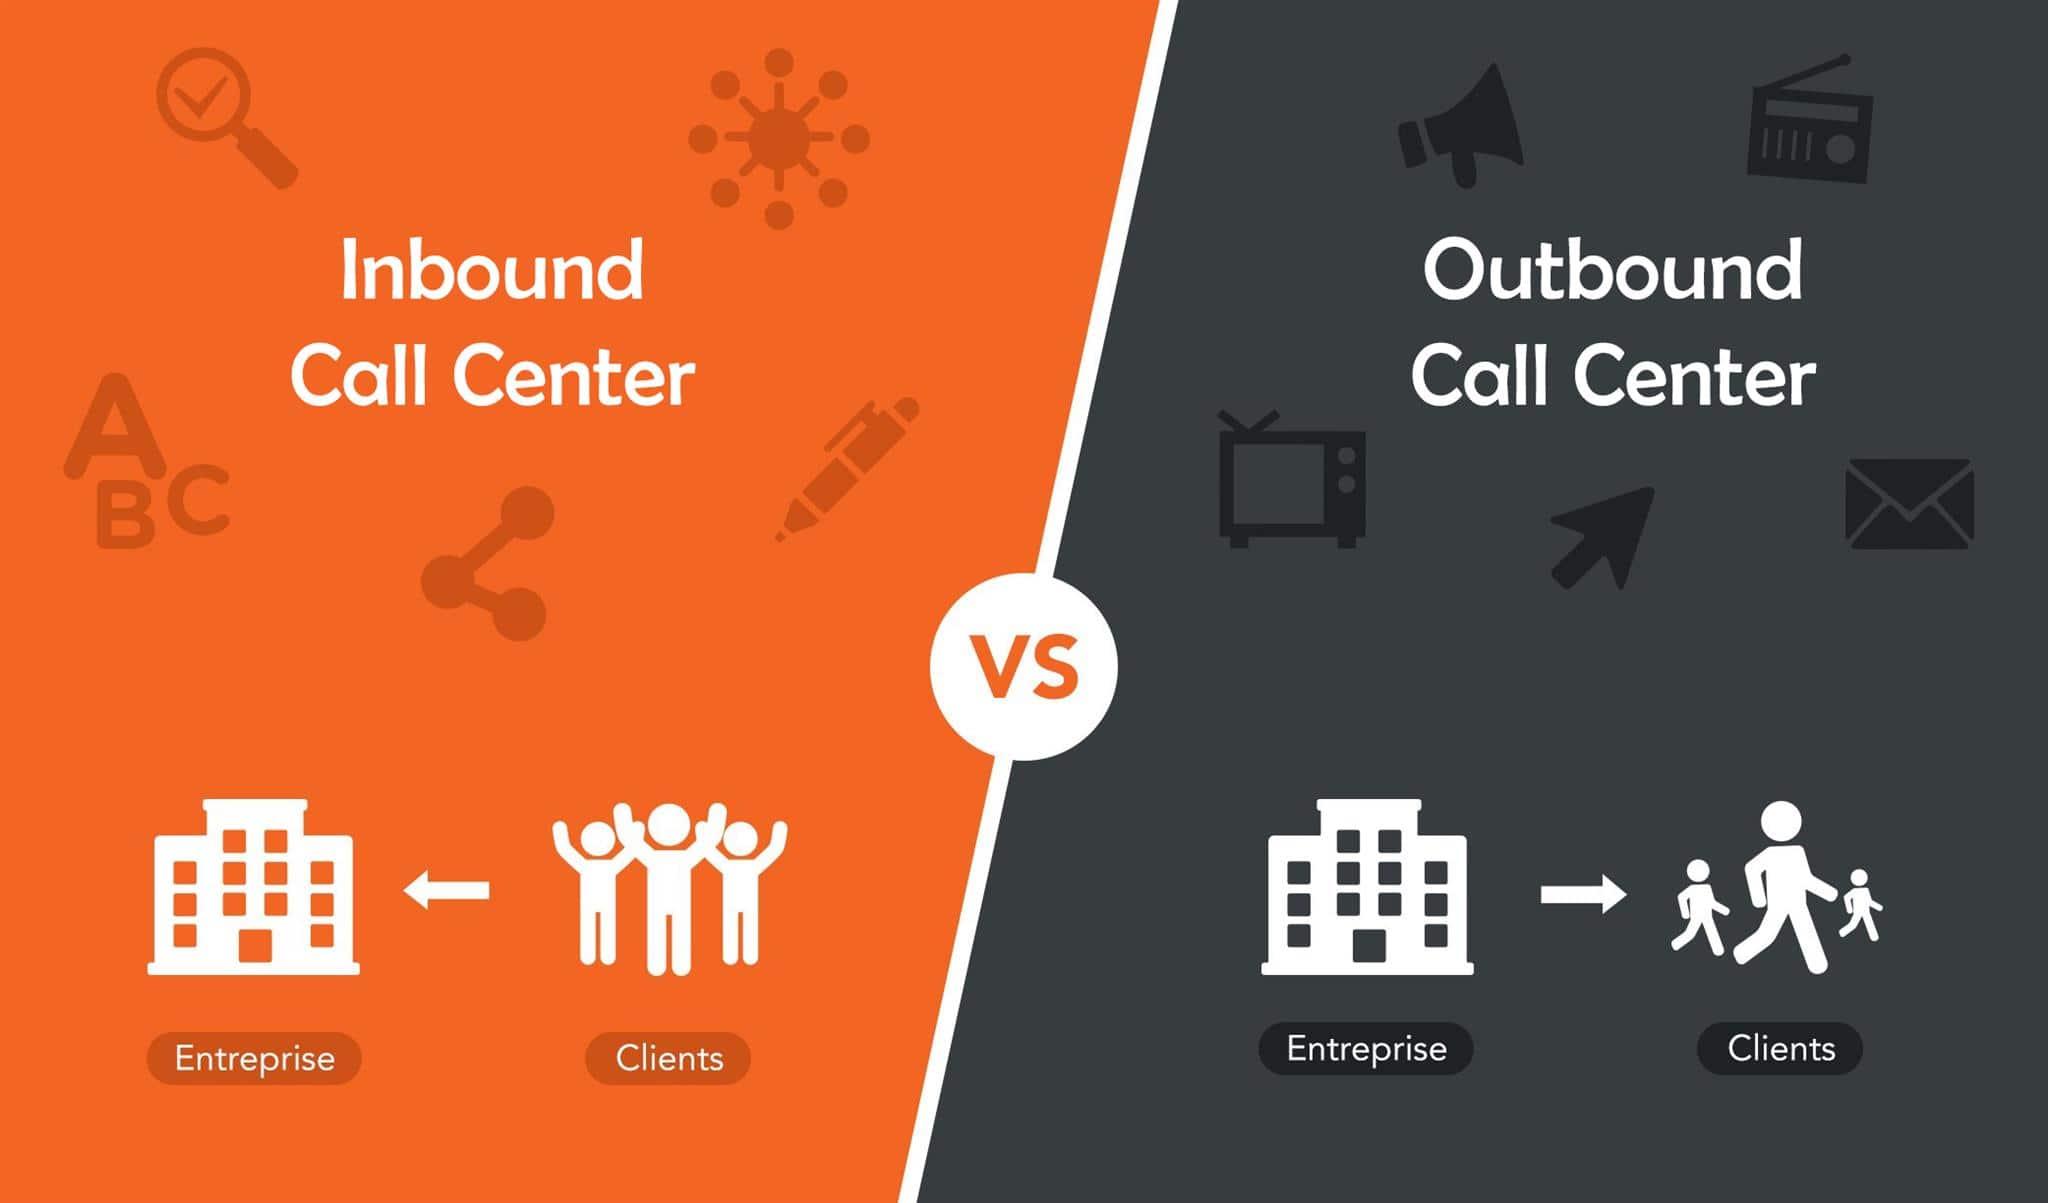 Inbound Call Center Vs Outbound Call Center in Pakistan